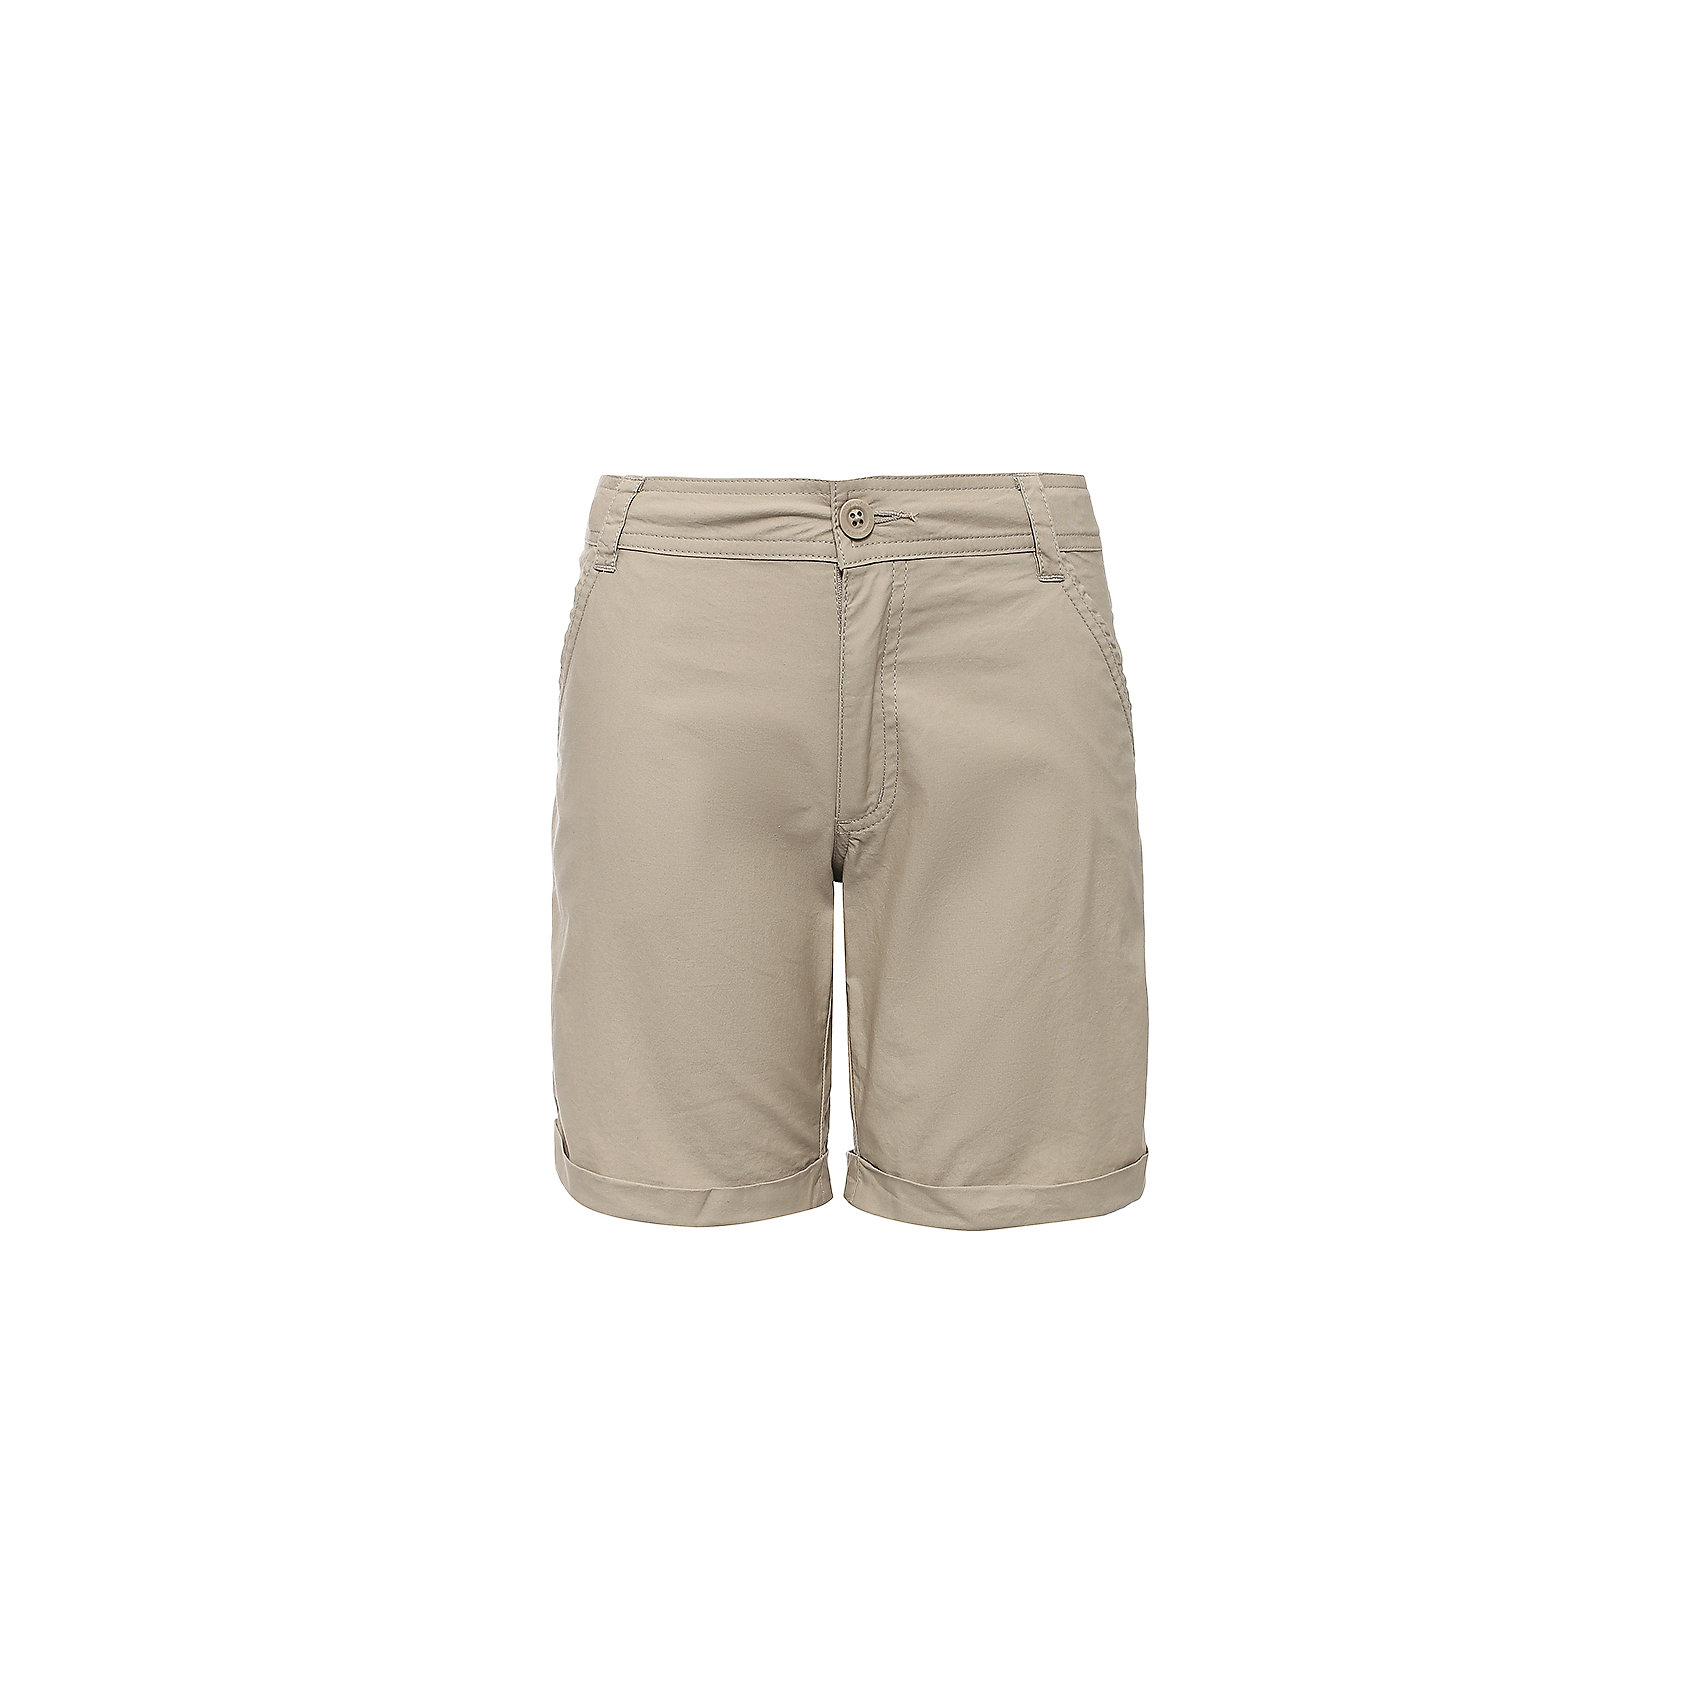 Шорты для мальчика Finn FlareШорты для мальчика от известного бренда Finn Flare<br>Фактура материала:Текстильный<br>Вид застежки:Молния<br> <br> Тип карманов:Втачные<br>Состав:<br>100% хлопок<br><br>Ширина мм: 191<br>Глубина мм: 10<br>Высота мм: 175<br>Вес г: 273<br>Цвет: серый<br>Возраст от месяцев: 144<br>Возраст до месяцев: 156<br>Пол: Мужской<br>Возраст: Детский<br>Размер: 158,110,122,134,146<br>SKU: 4835950